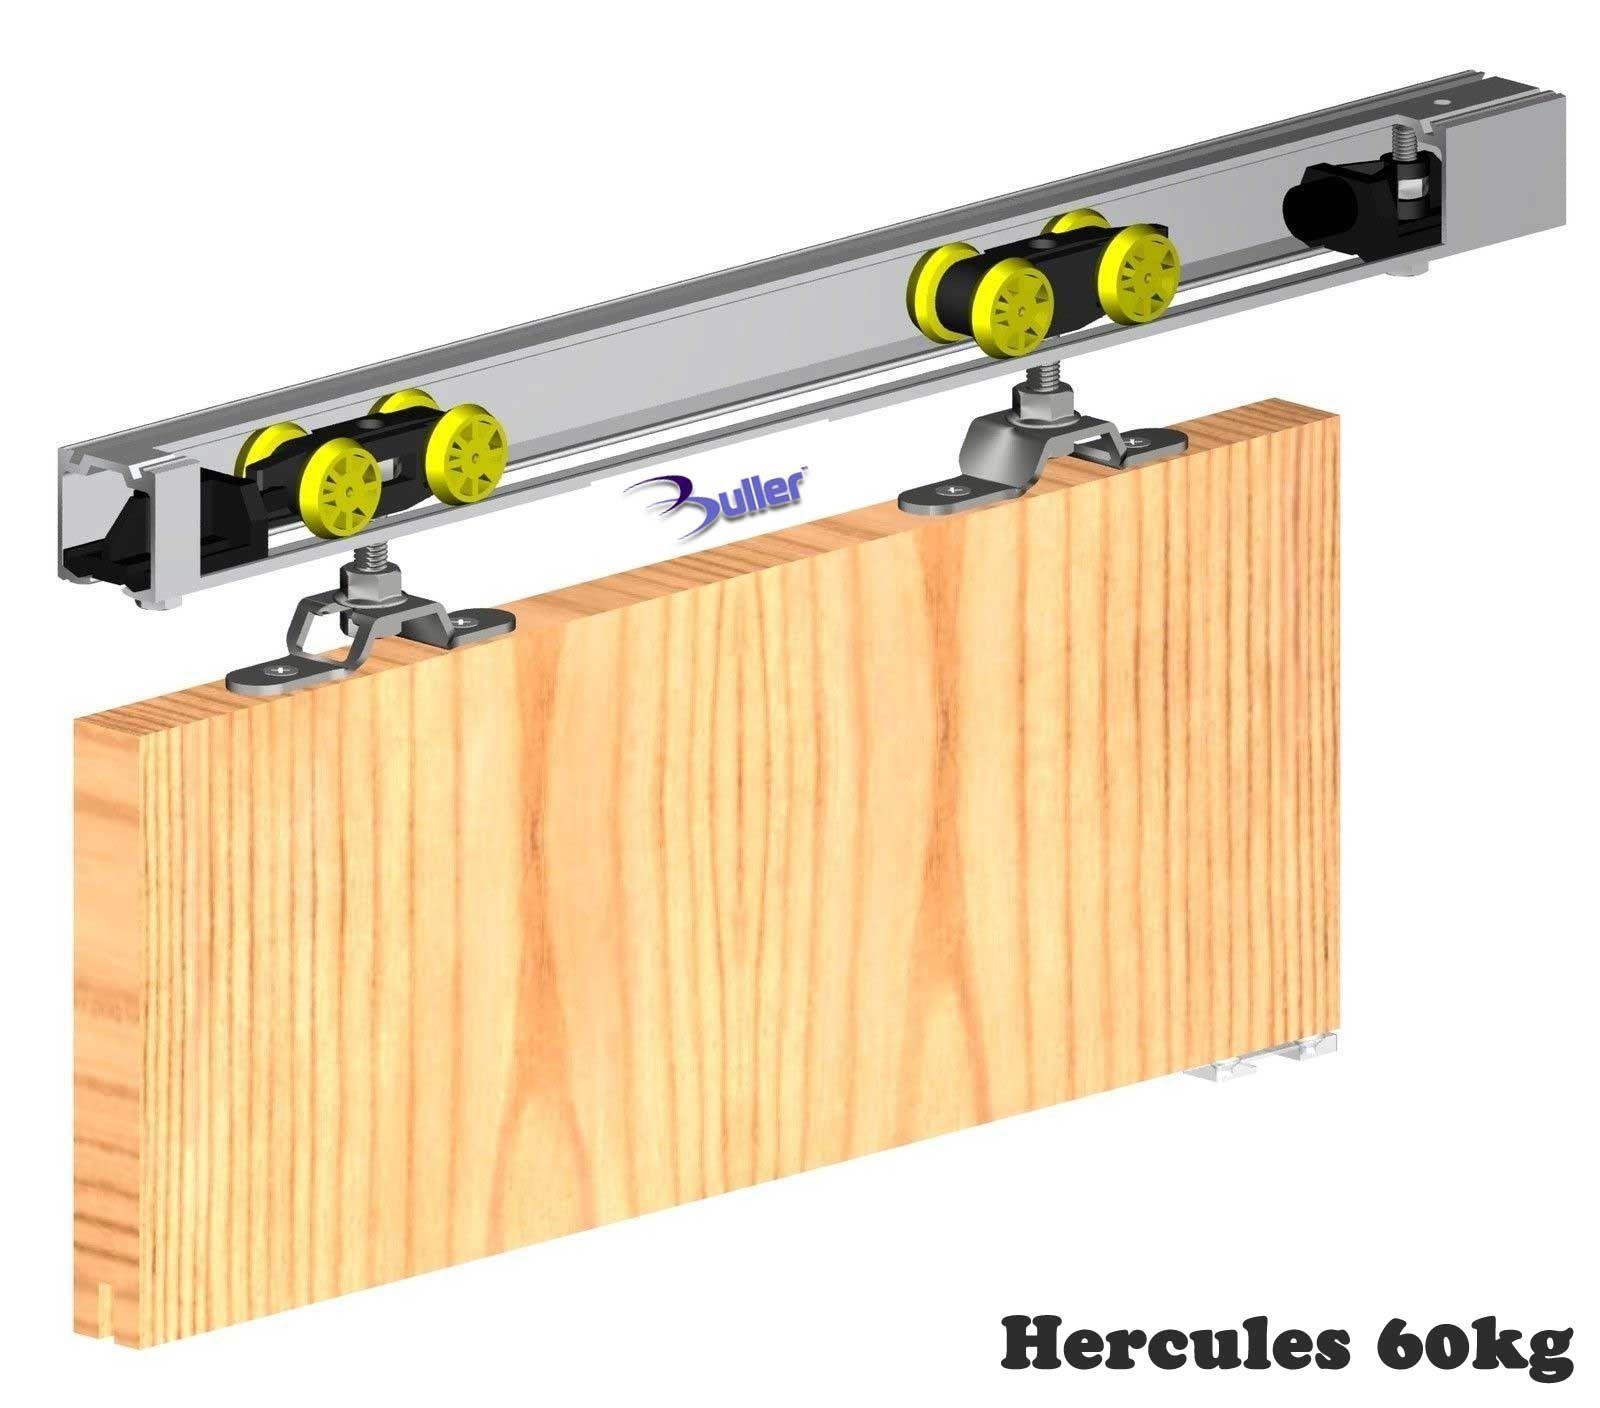 Hercules Sliding Door Gear Top Hung Track And Rollers For 60kg Or 120kg Doors From Buller Ltd Barn Doors Sliding External Sliding Doors Sliding Folding Doors